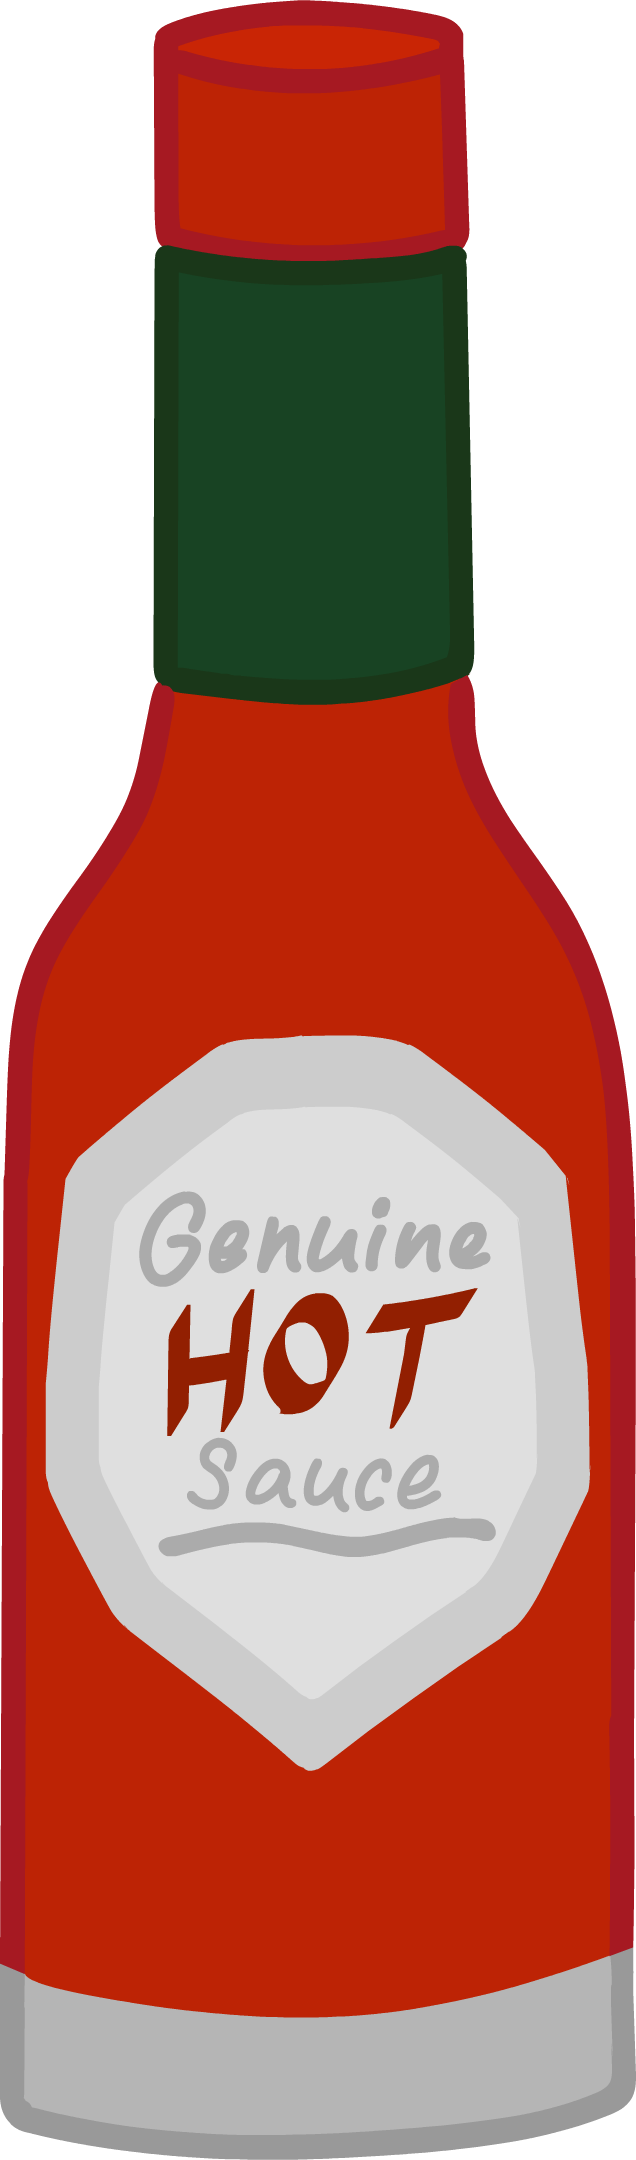 Hot sauce.png - Hot Sauce Bottle PNG